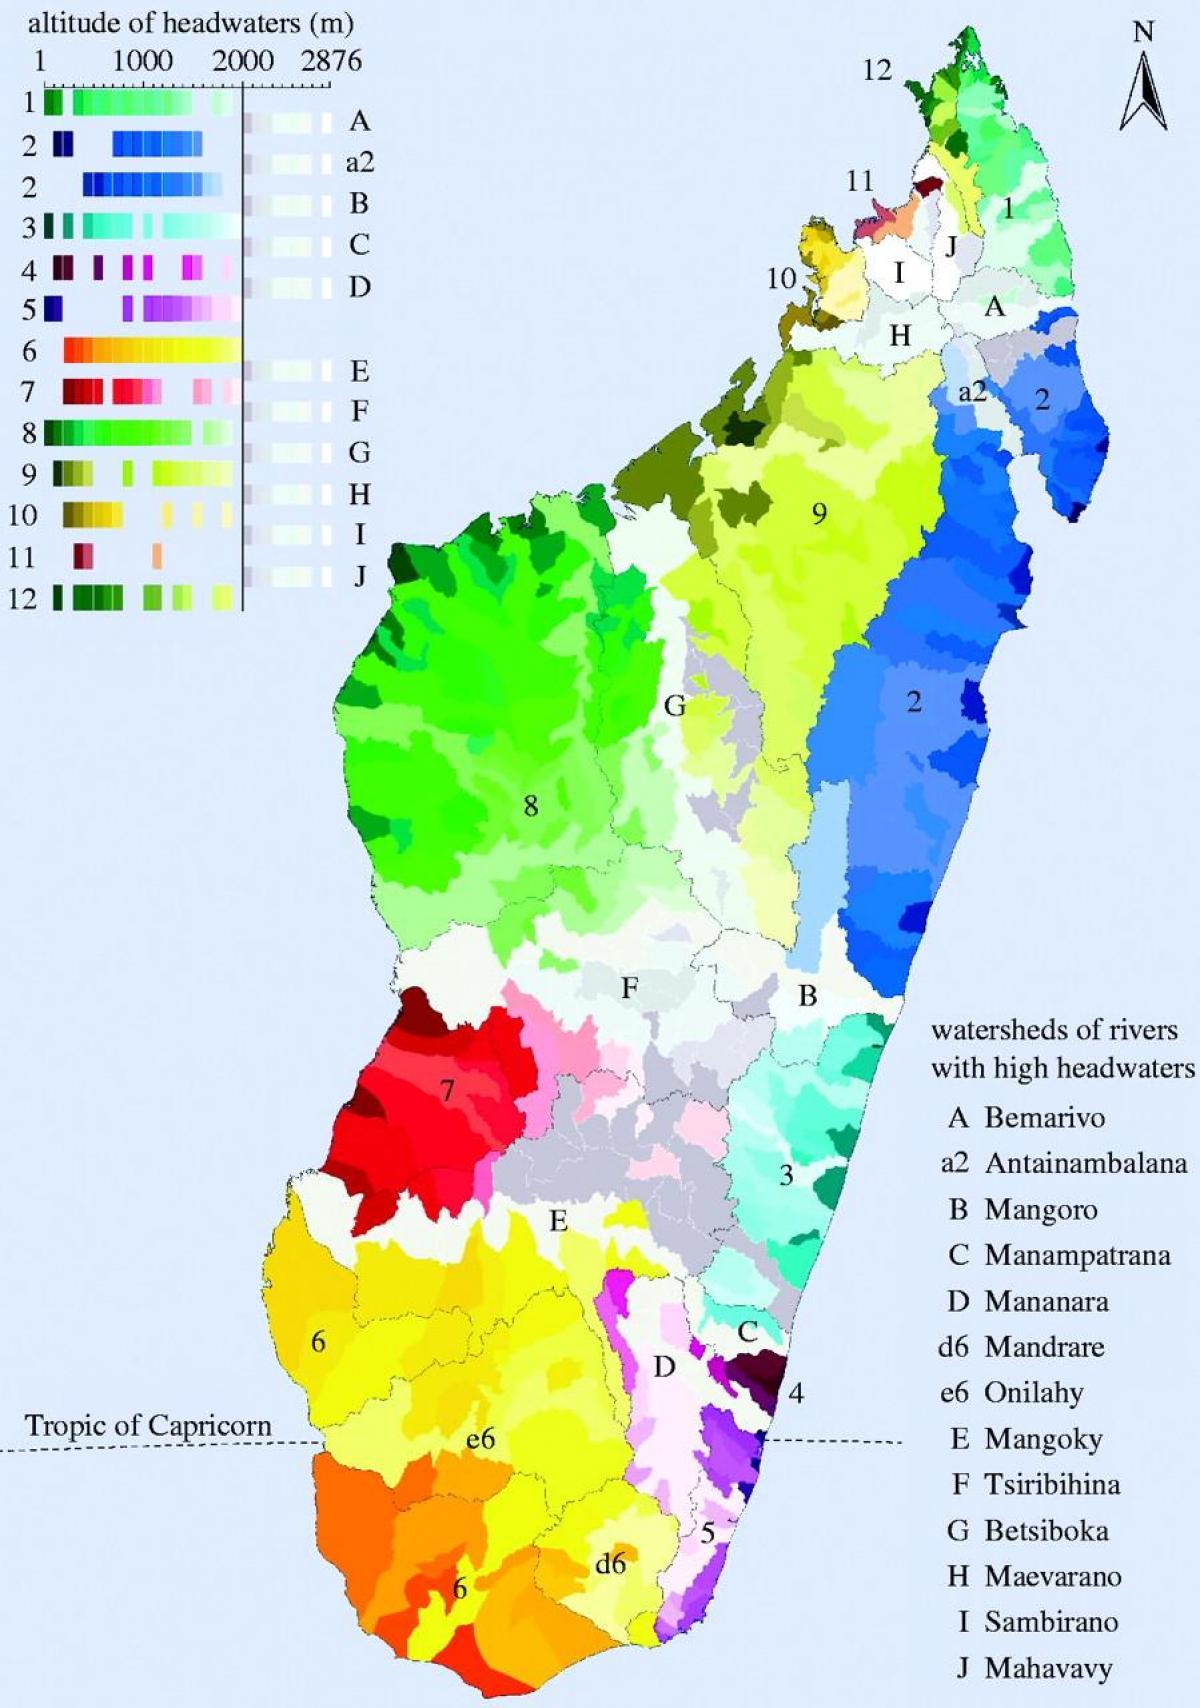 Carte Climat Madagascar.Madagascar Climat Carte Carte De Madagascar Climat